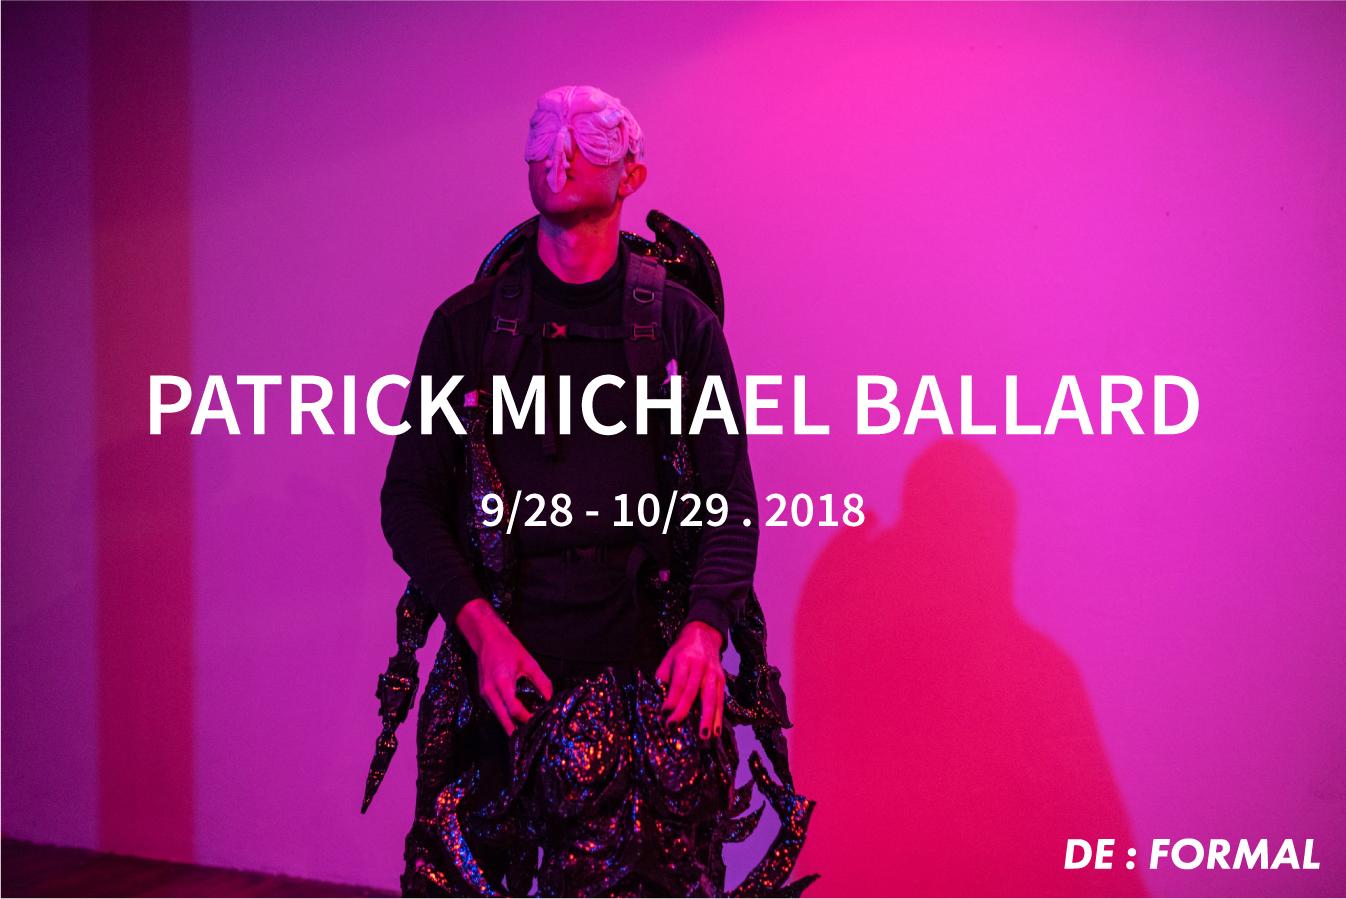 patrick-ballard-poster.jpg